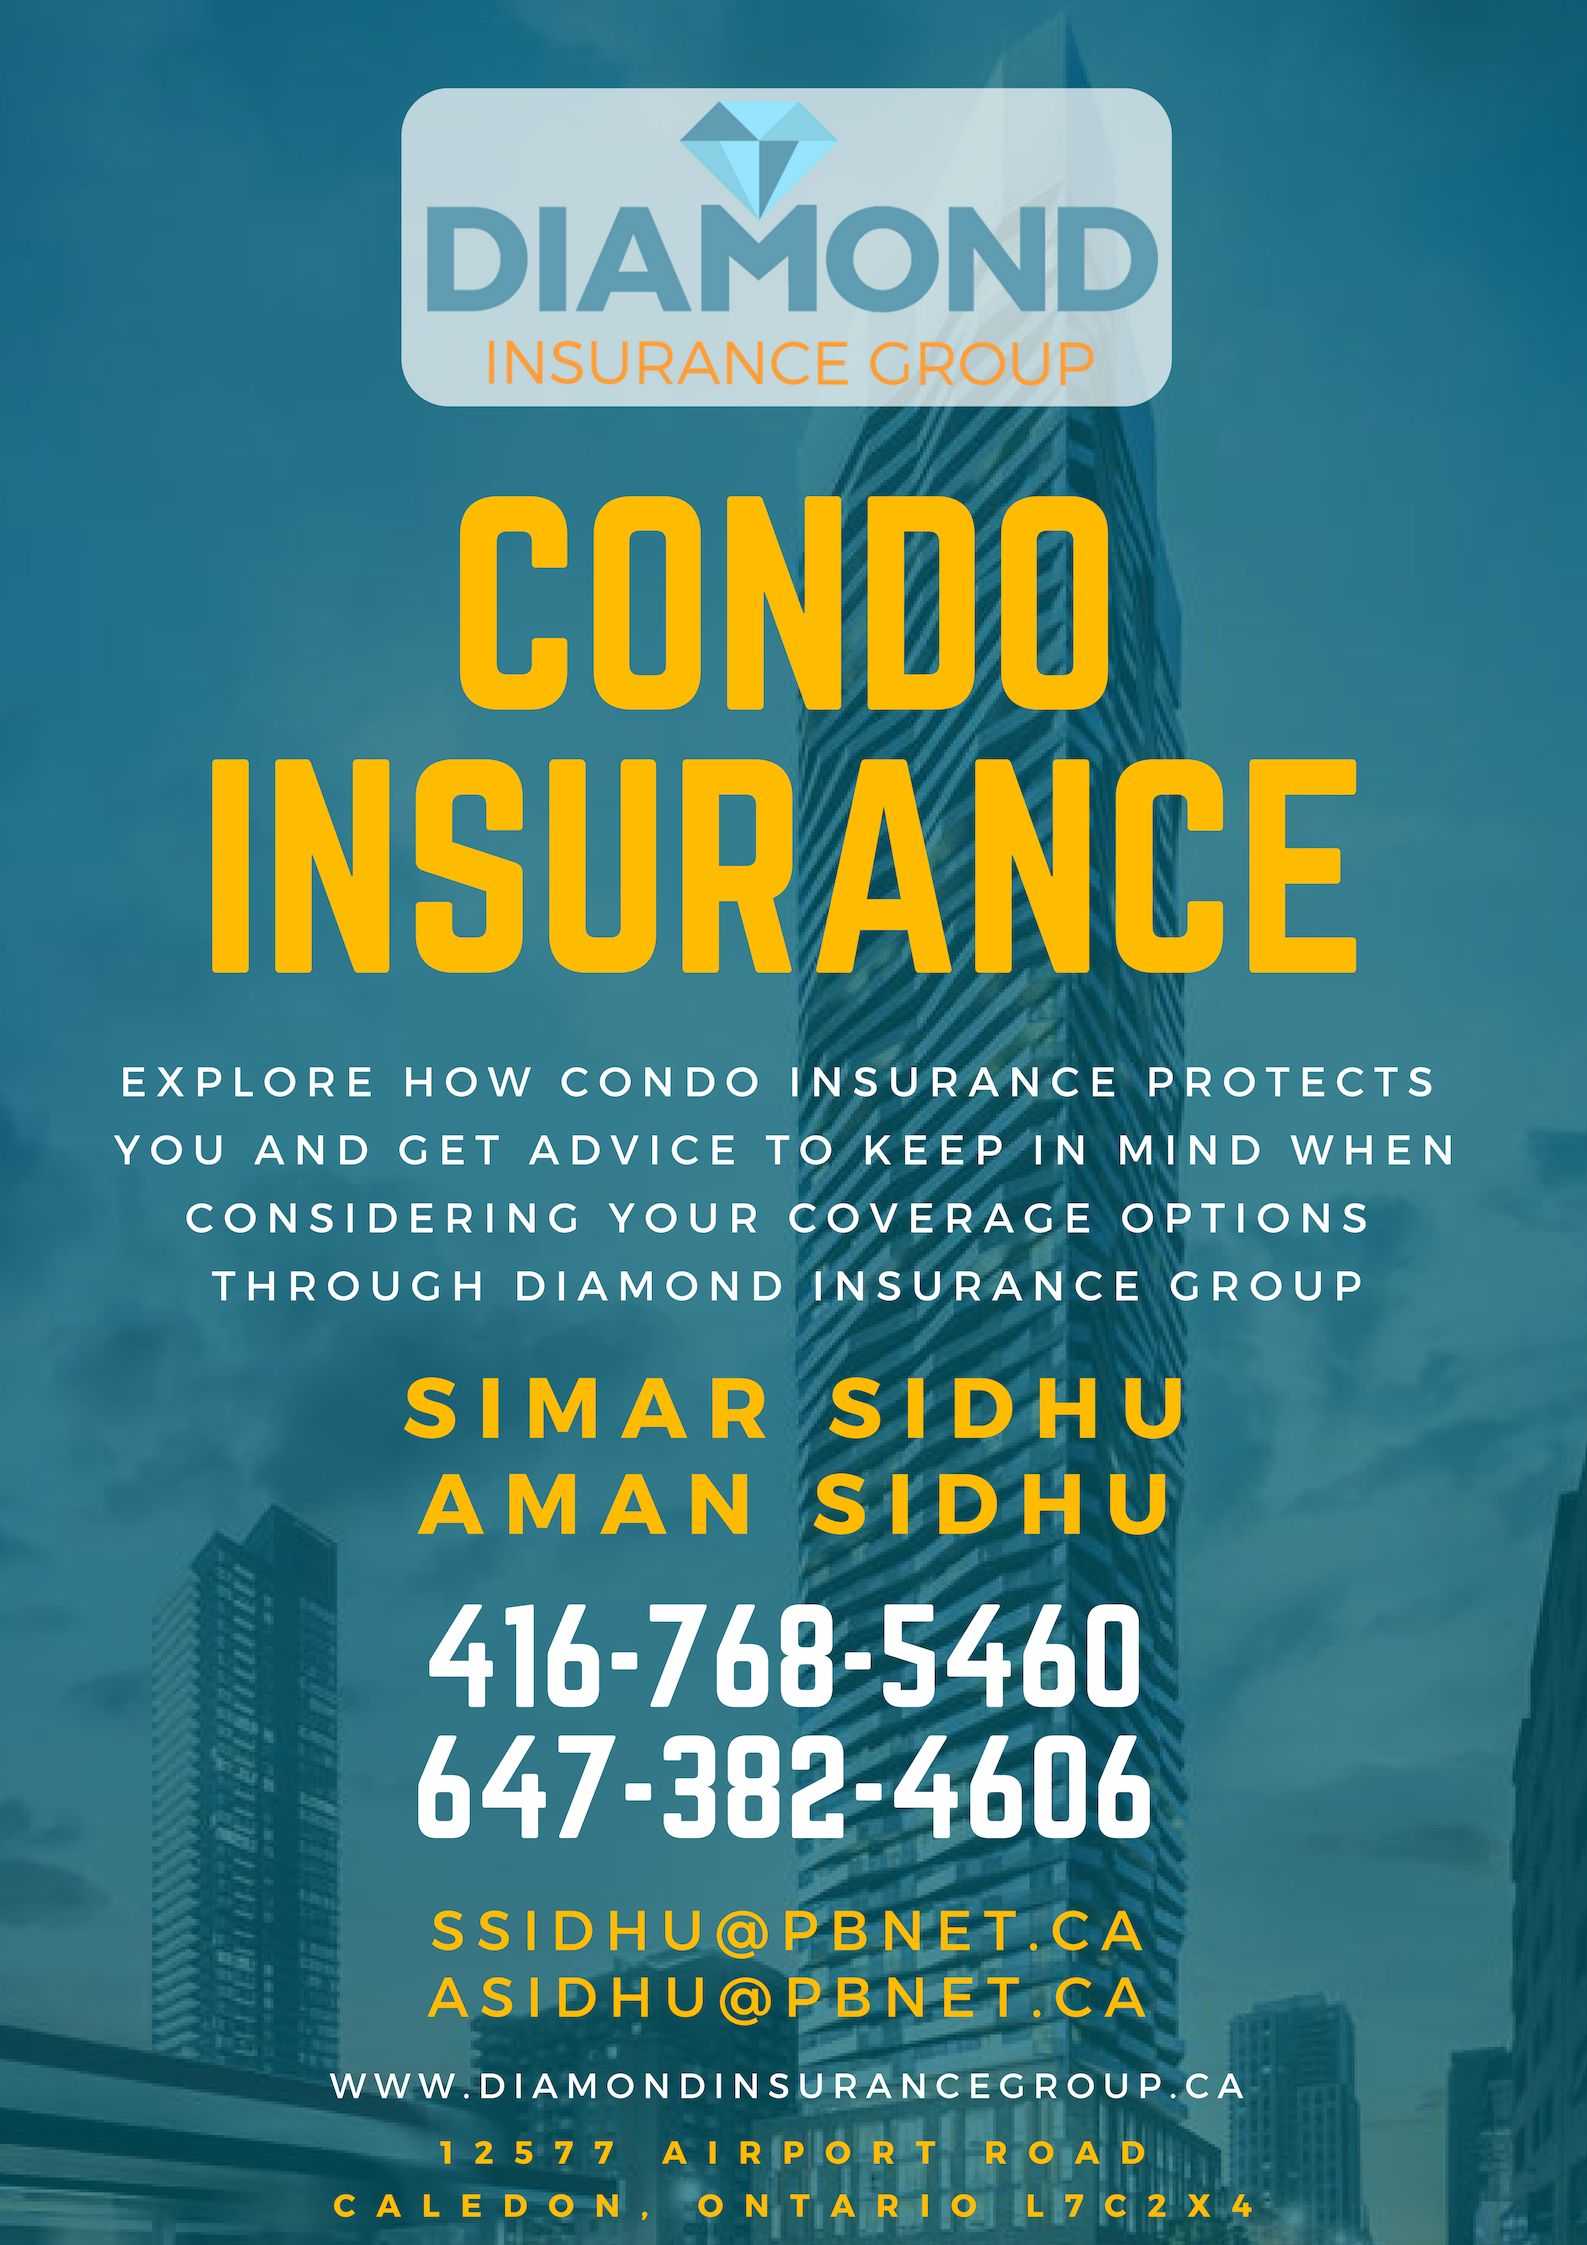 Pin on Condo Insurance